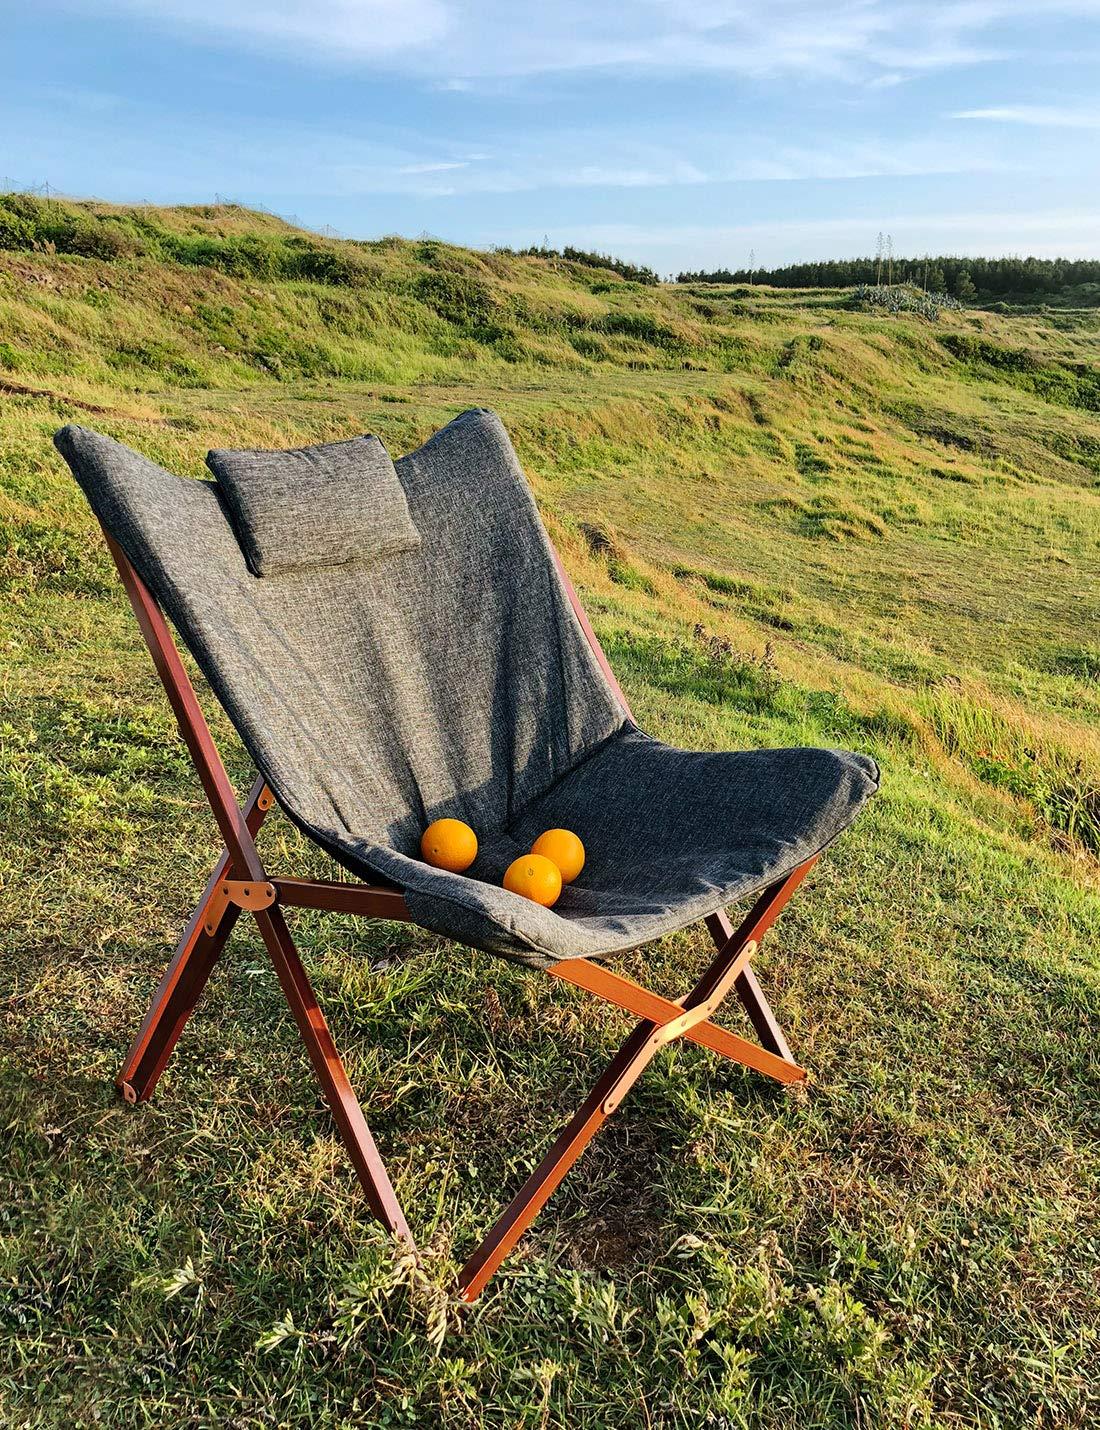 Full Size of Lounge Klappstuhl Suhu Camping Stuhl Sessel Modern Design Retro Möbel Garten Loungemöbel Günstig Holz Set Sofa Wohnzimmer Lounge Klappstuhl